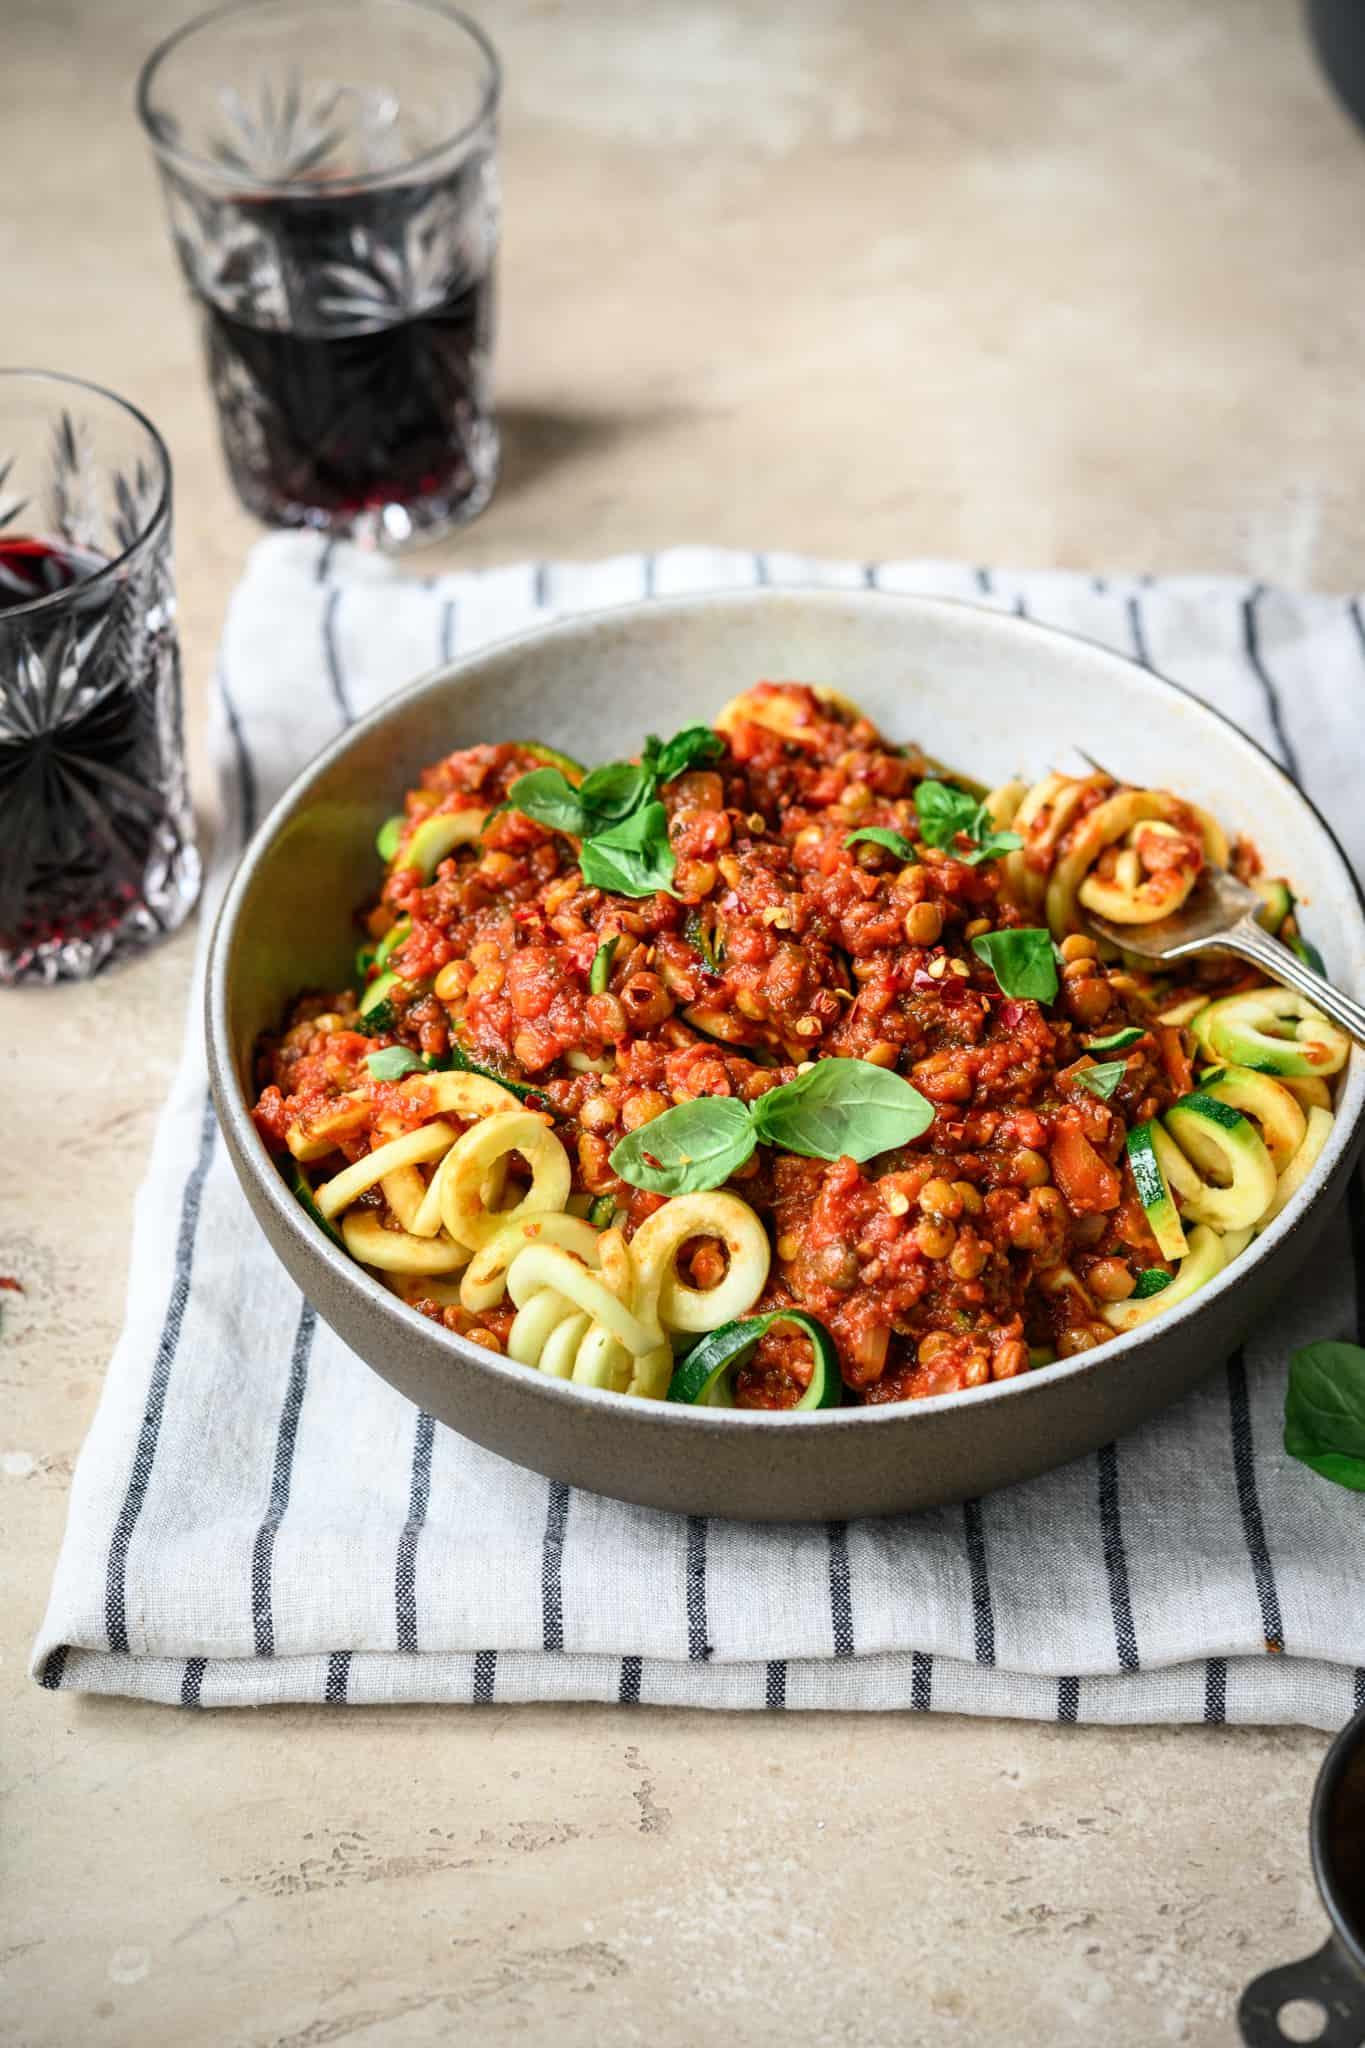 side view of vegan lentil bolognese sauce over zucchini noodles